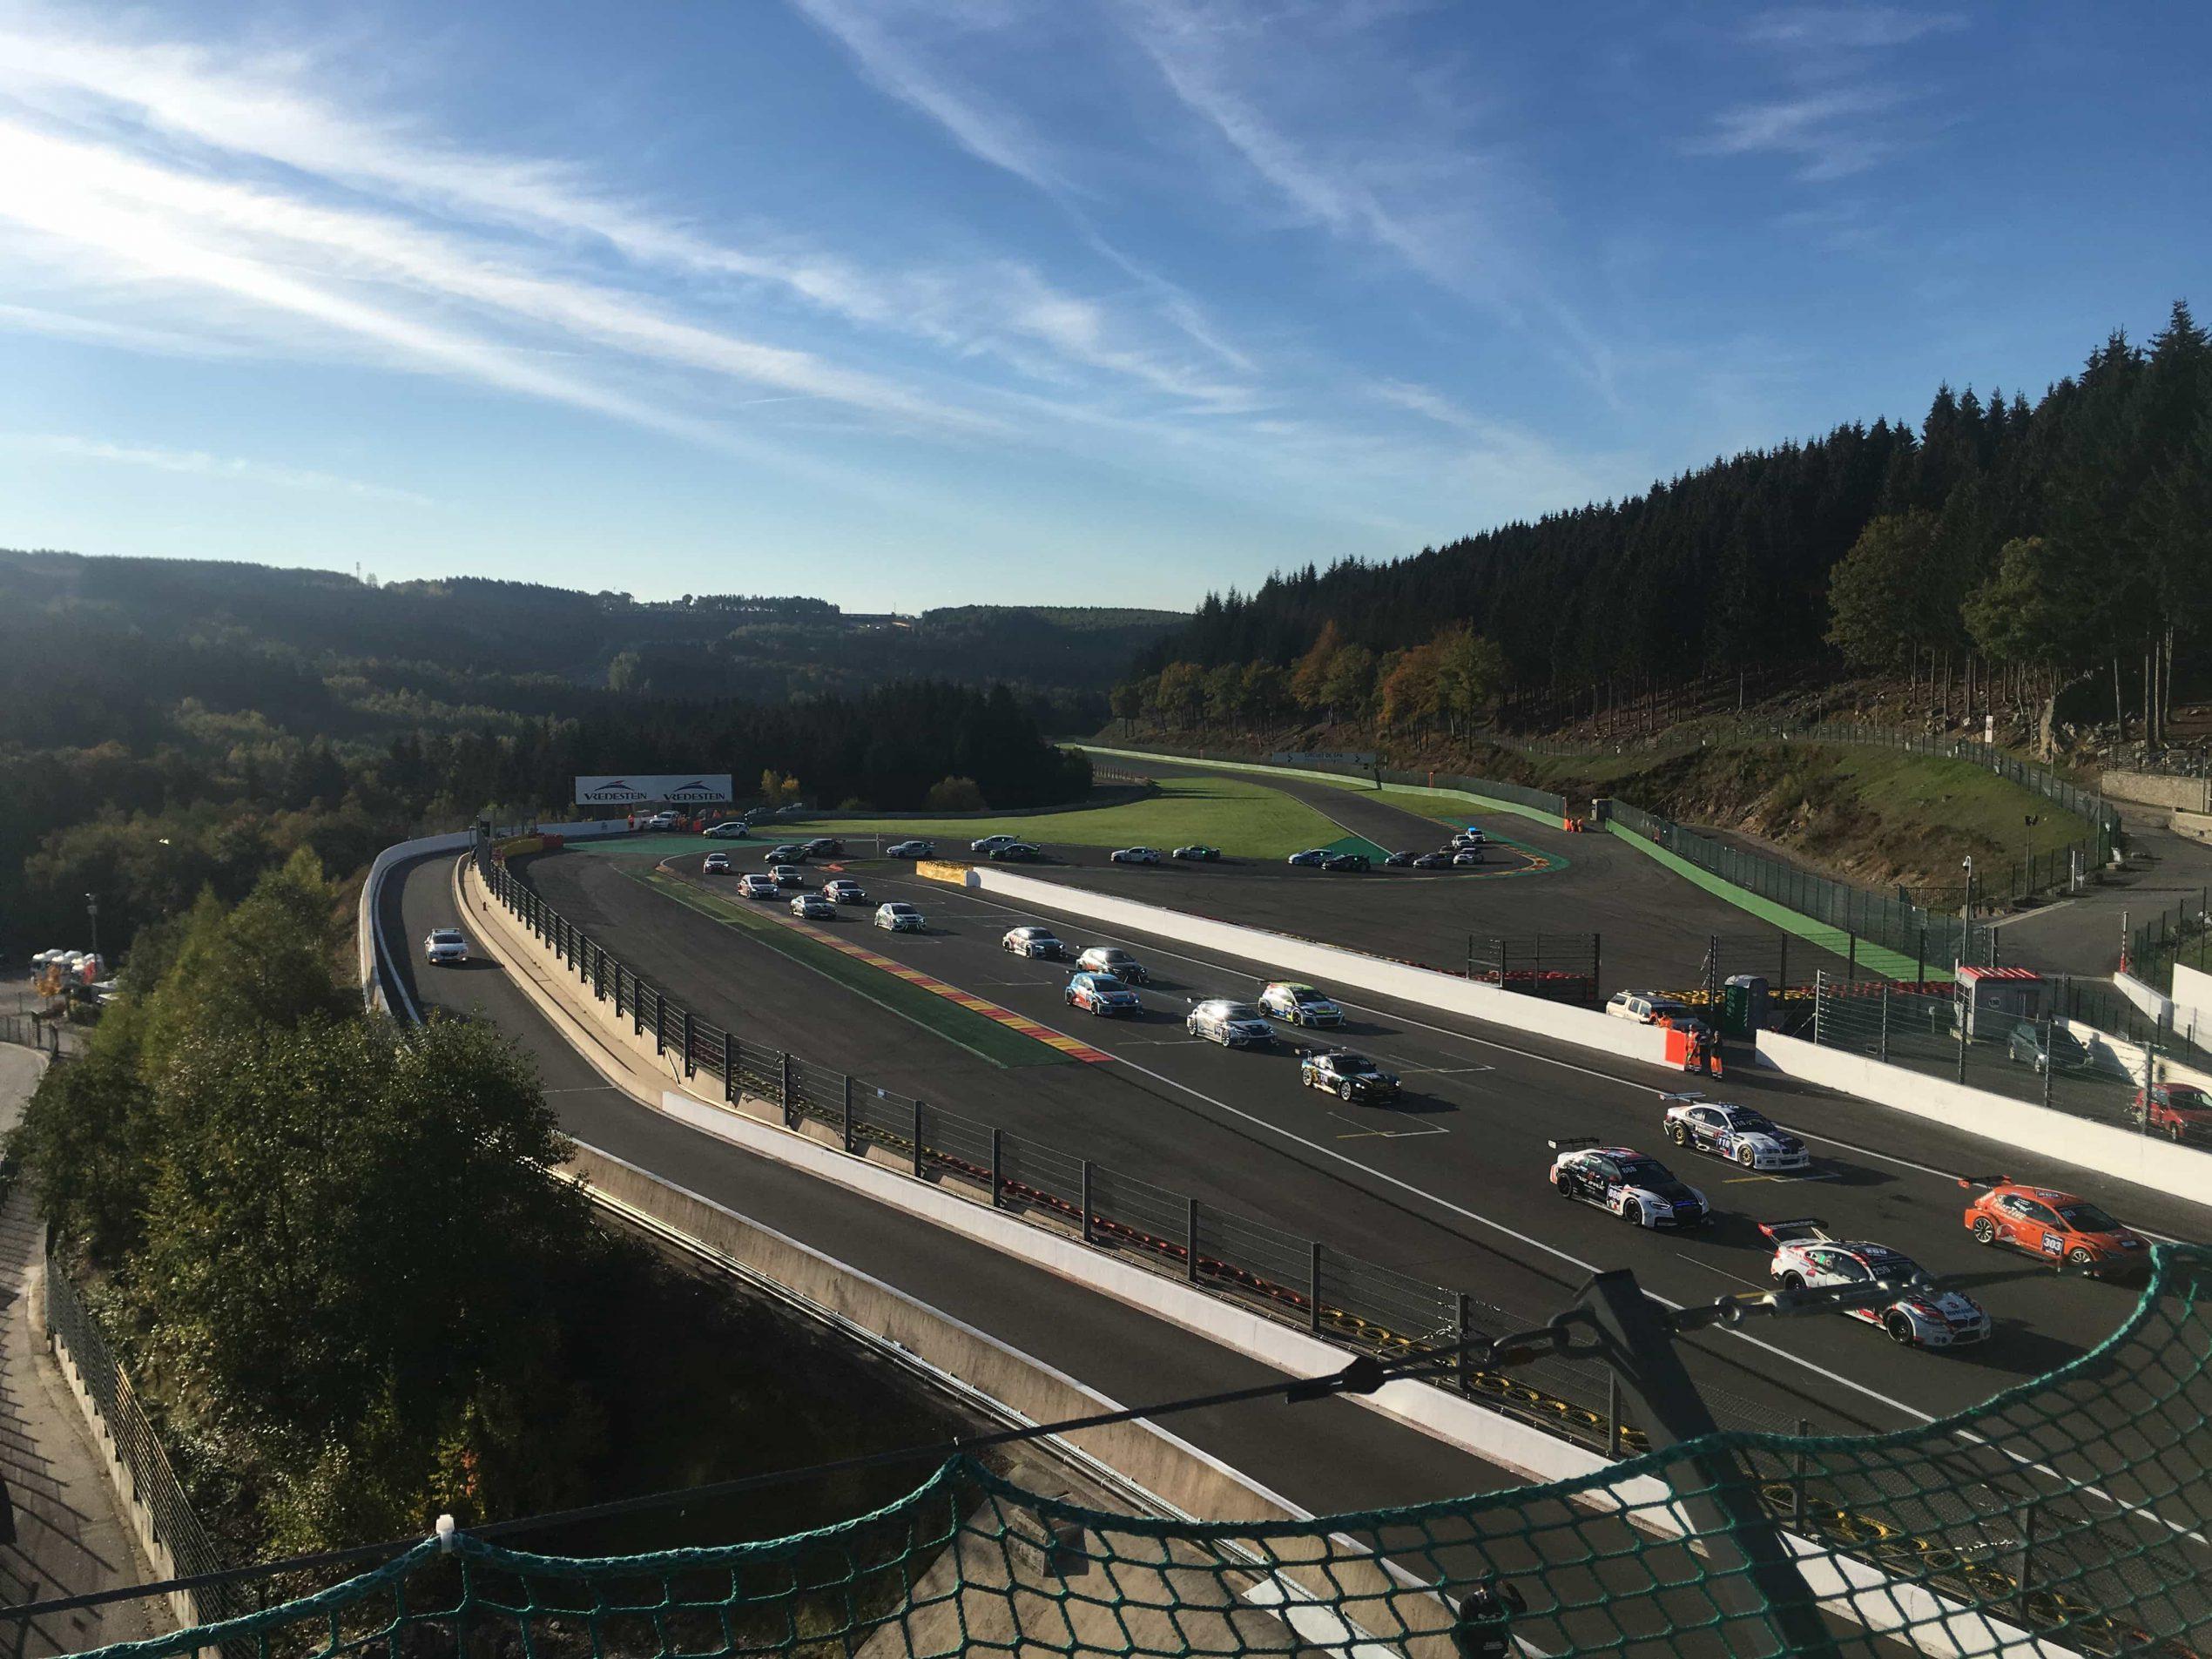 IMG 0941 - 12.-14. Oktober 2018 – 12h Spa-Francorchamps – Spa / BEL